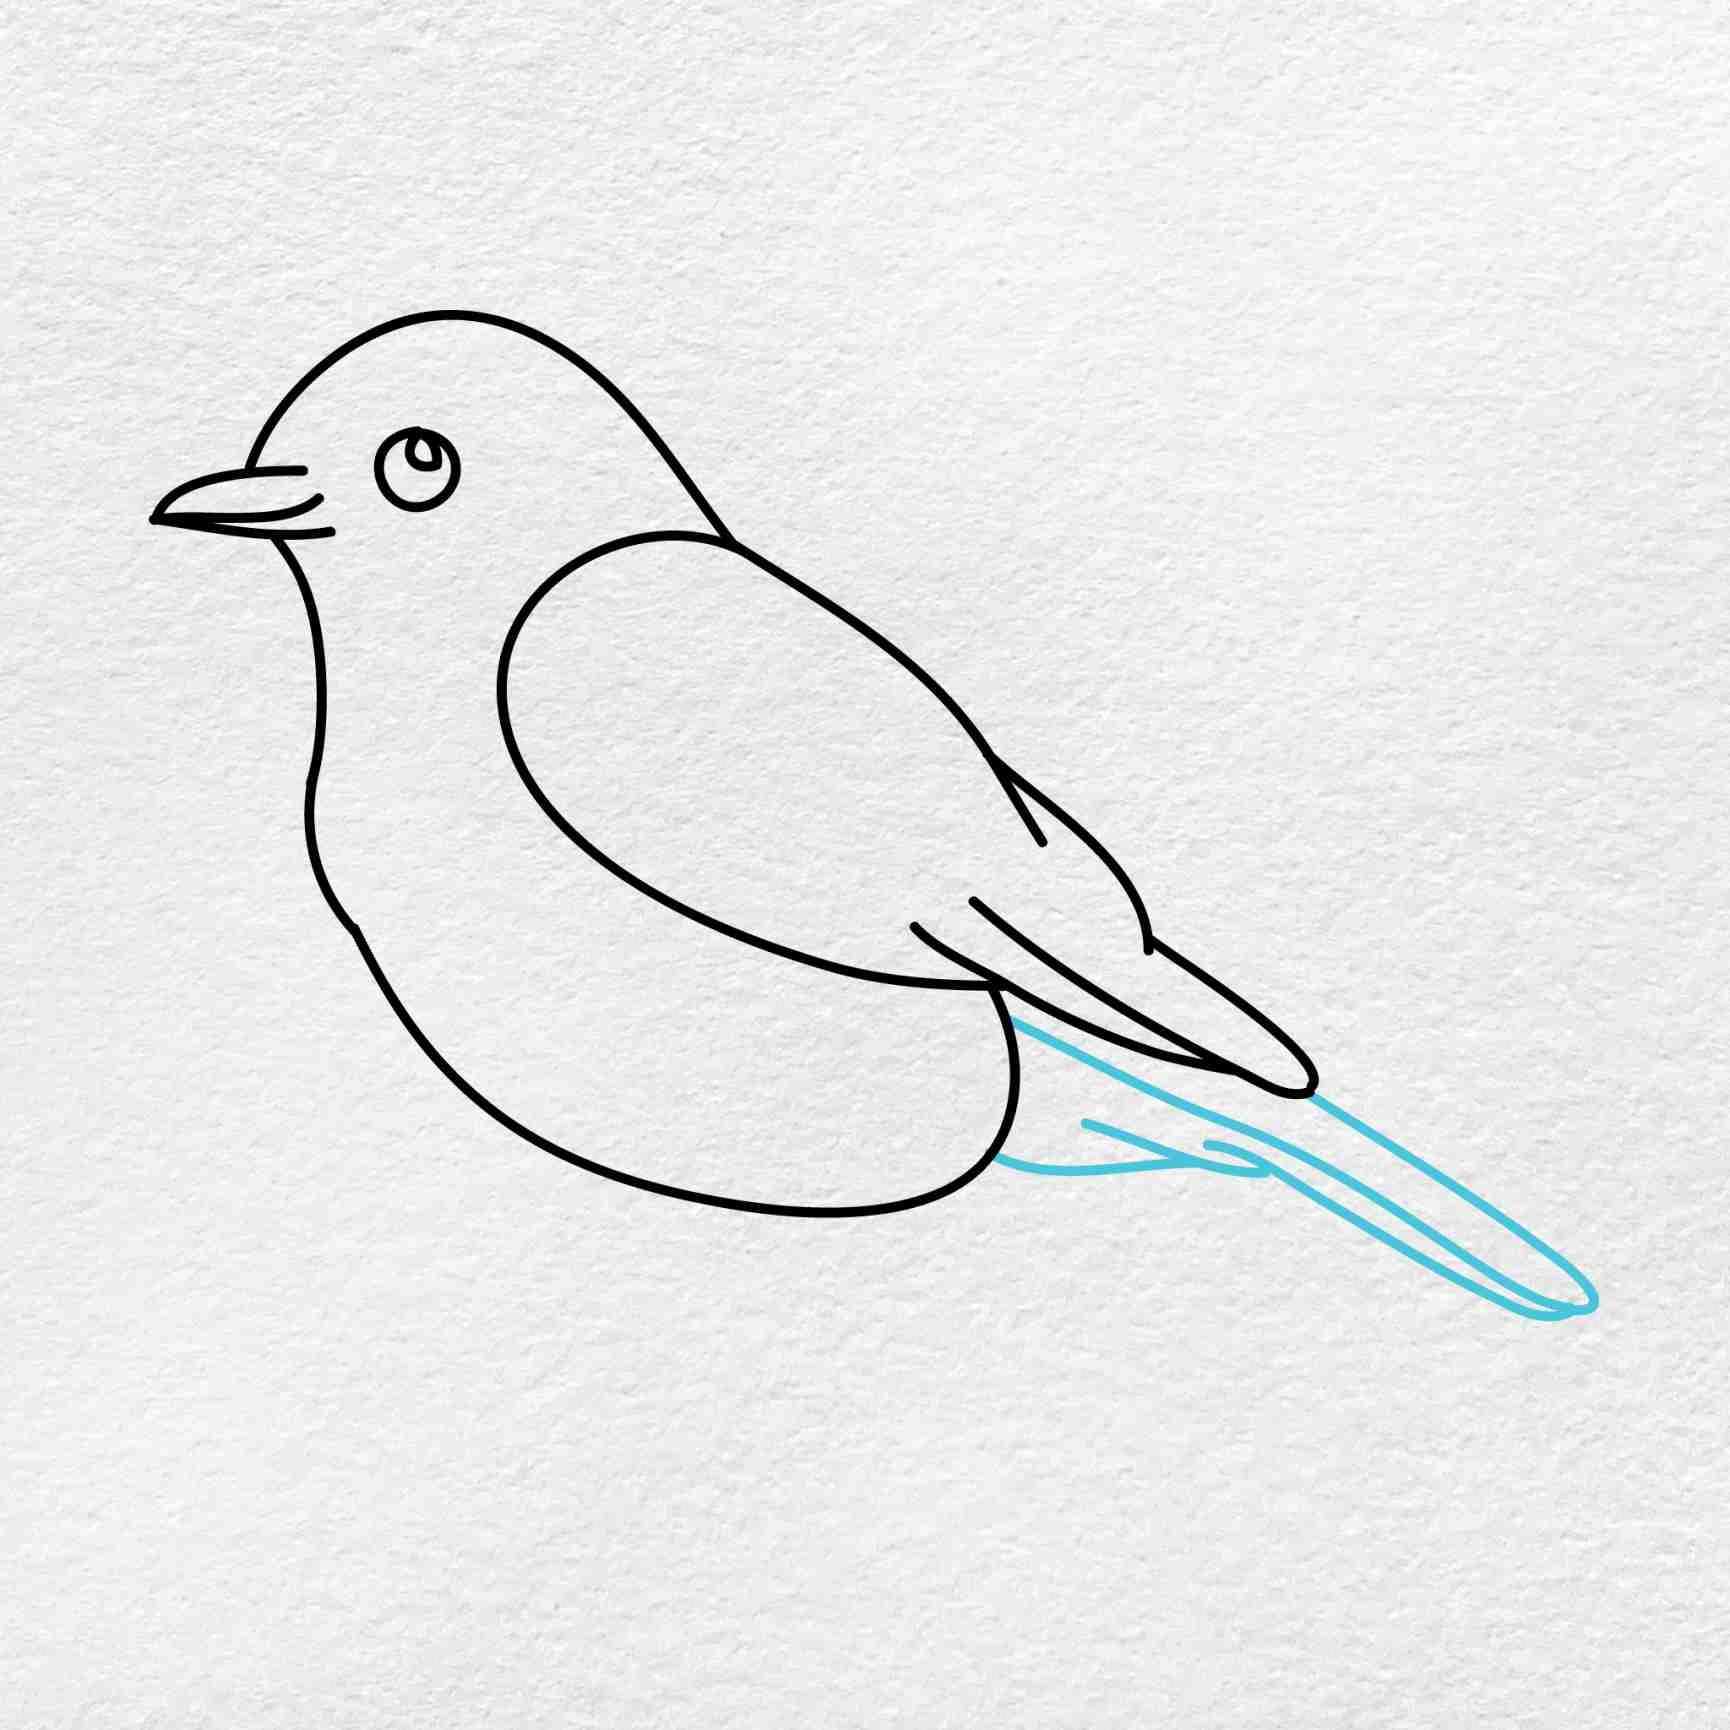 Bluebird Drawing: Step 4